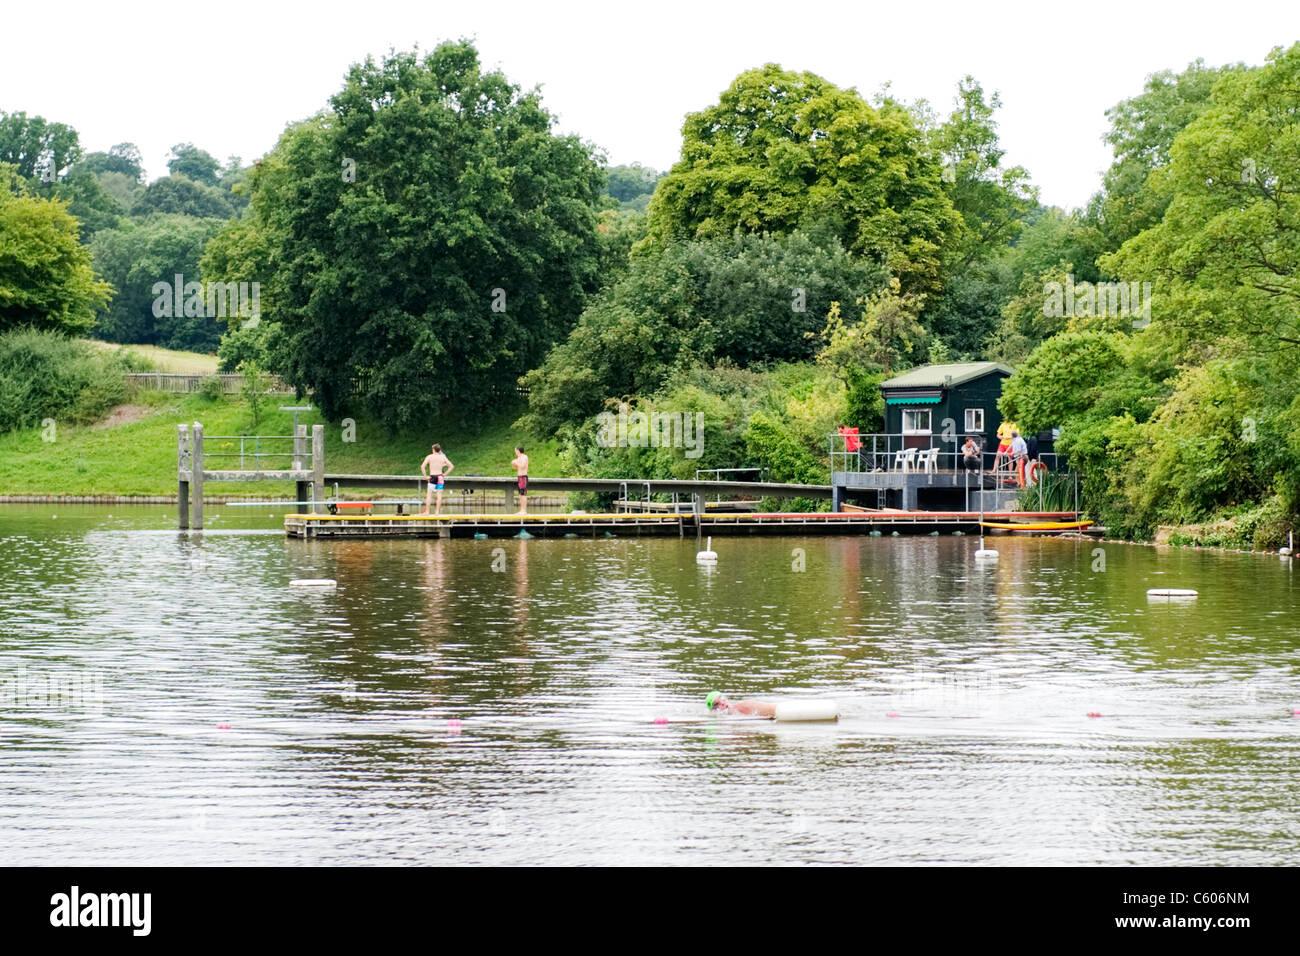 London Parliament Hill Hampstead Heath Highgate Men ' s Bathing Pond man swimming men standing on jetty pier - Stock Image